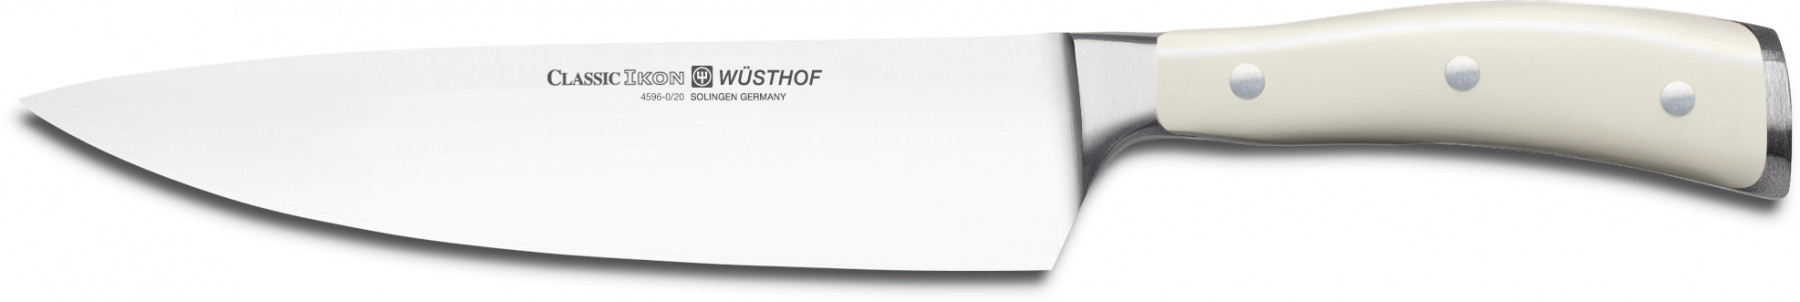 Wüsthof Dreizack Messerset Classic Ikon Creme 3tlg. Kochmesser